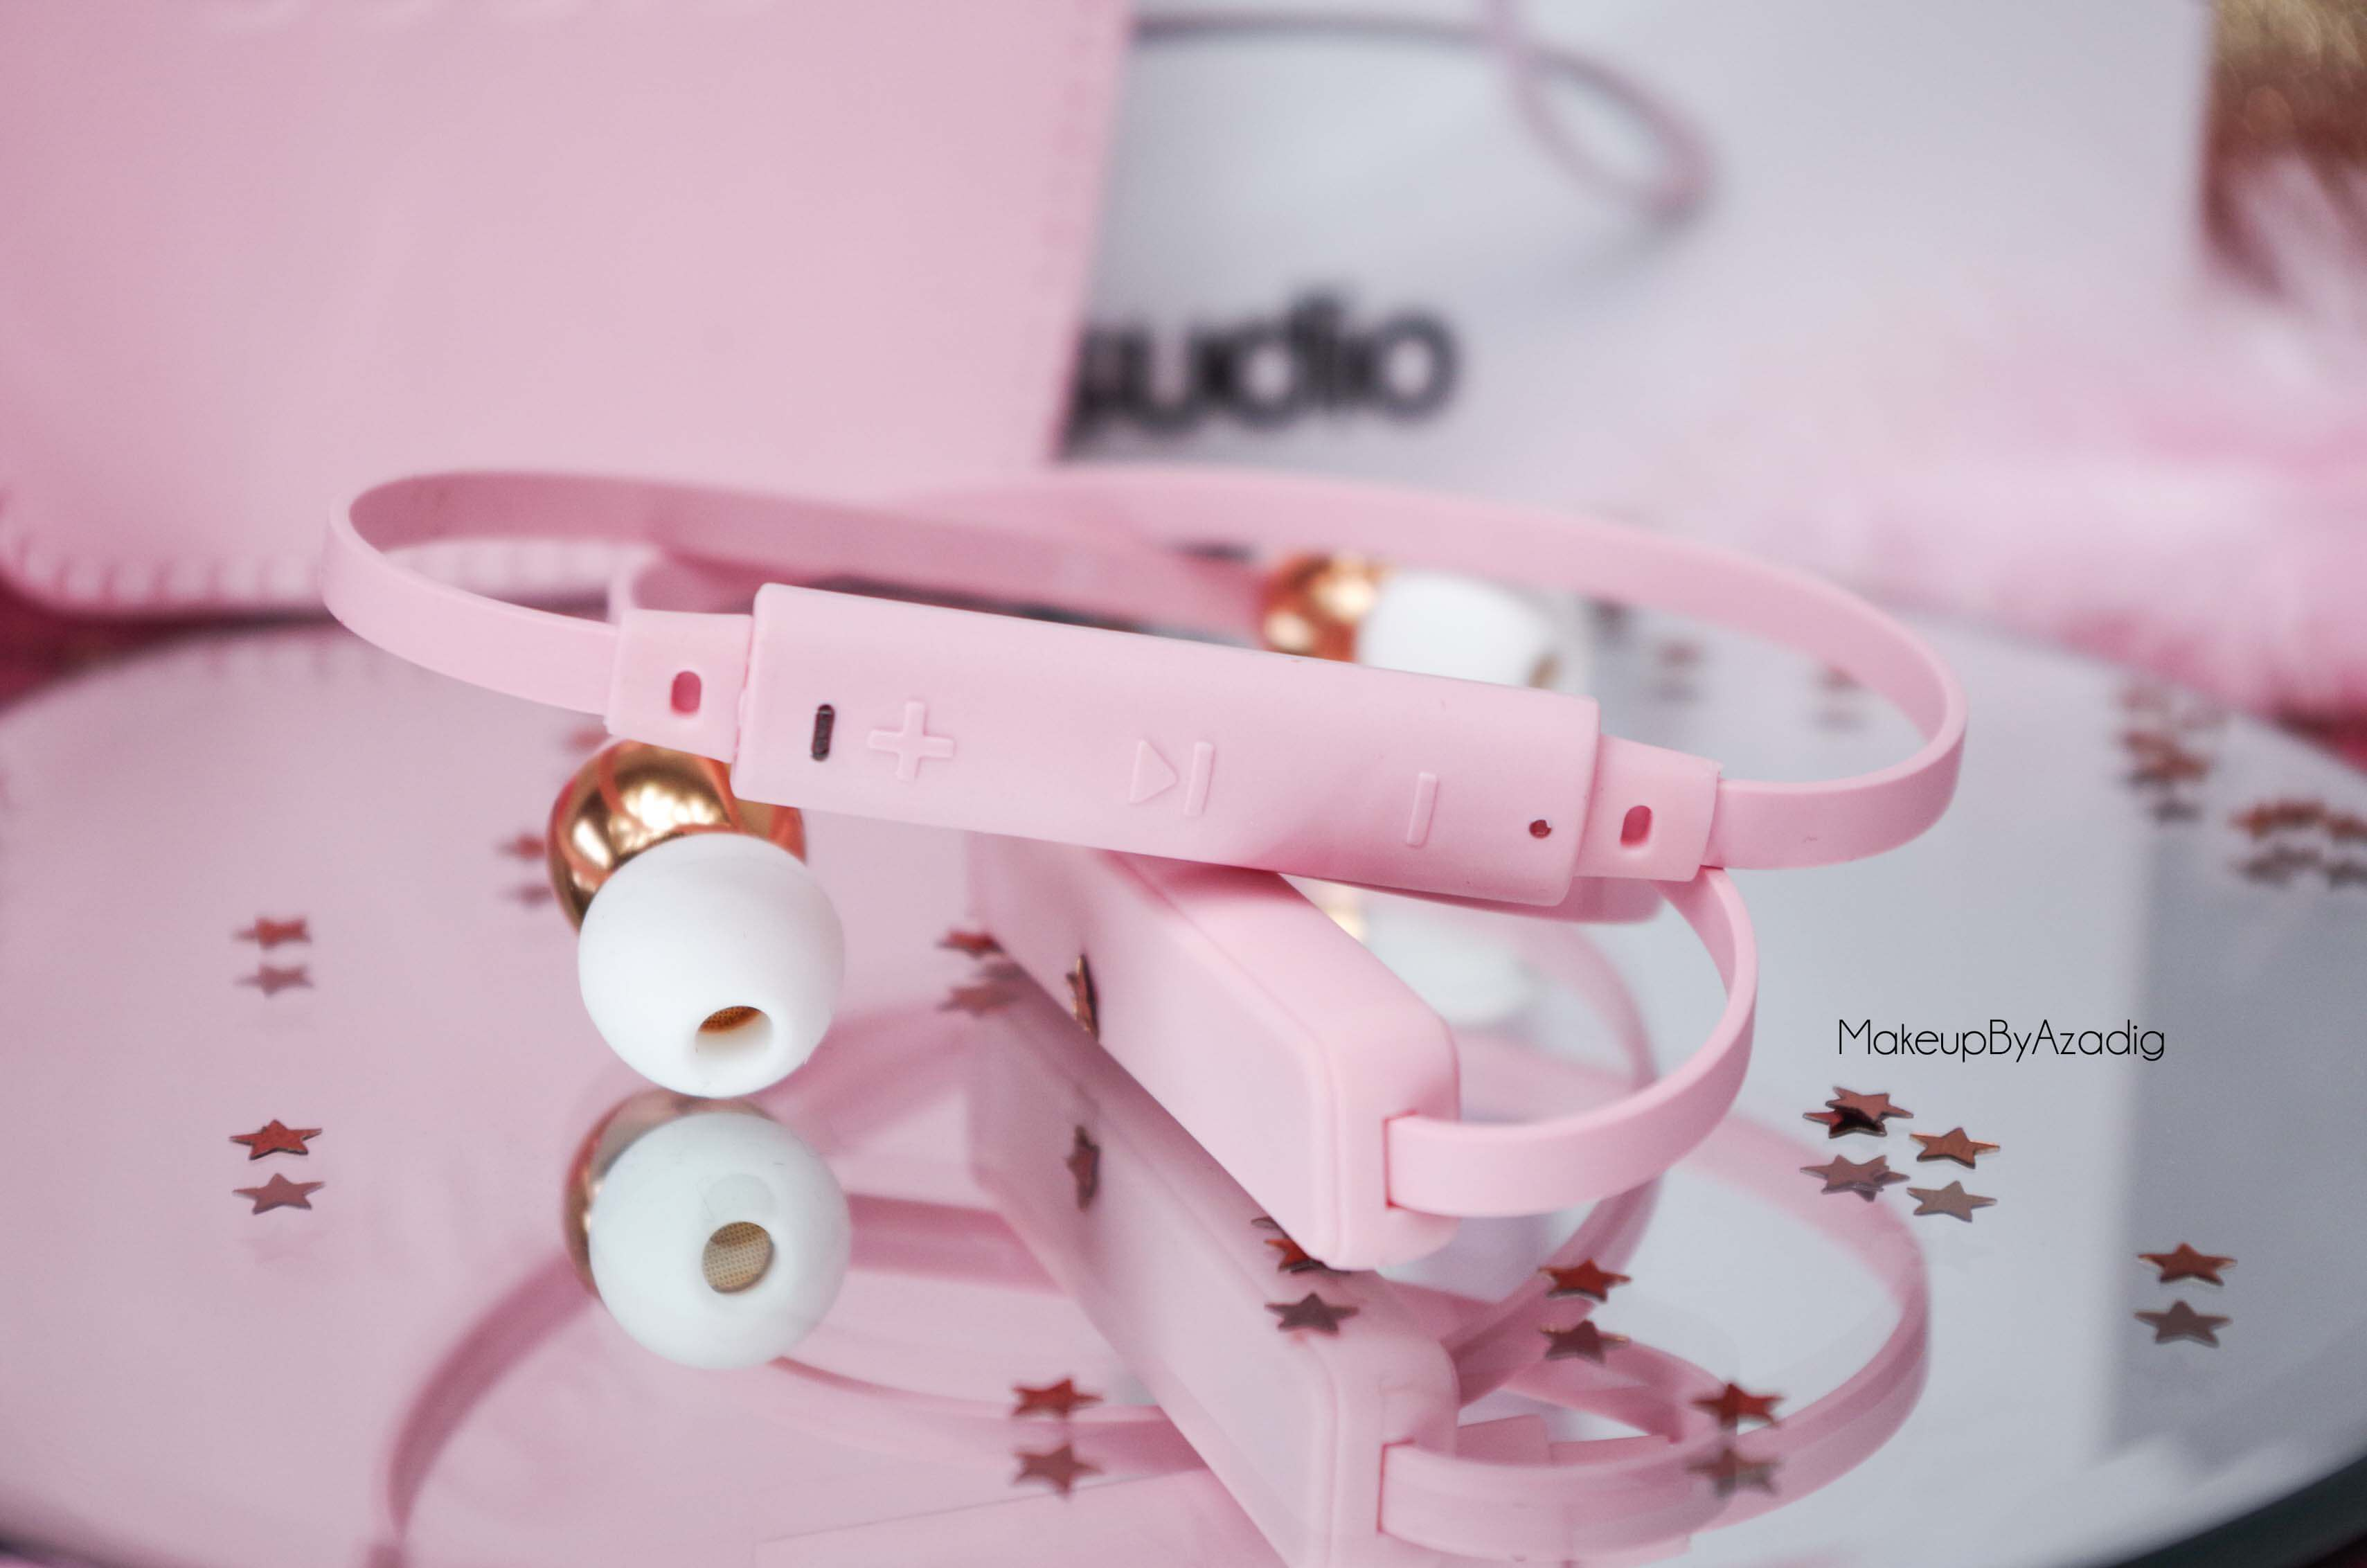 ecouteurs-casque-sans-fil-bluetooth-design-tendance-sudio-sweden-rose-vasa-bla-makeupbyazadig-avis-prix-blog